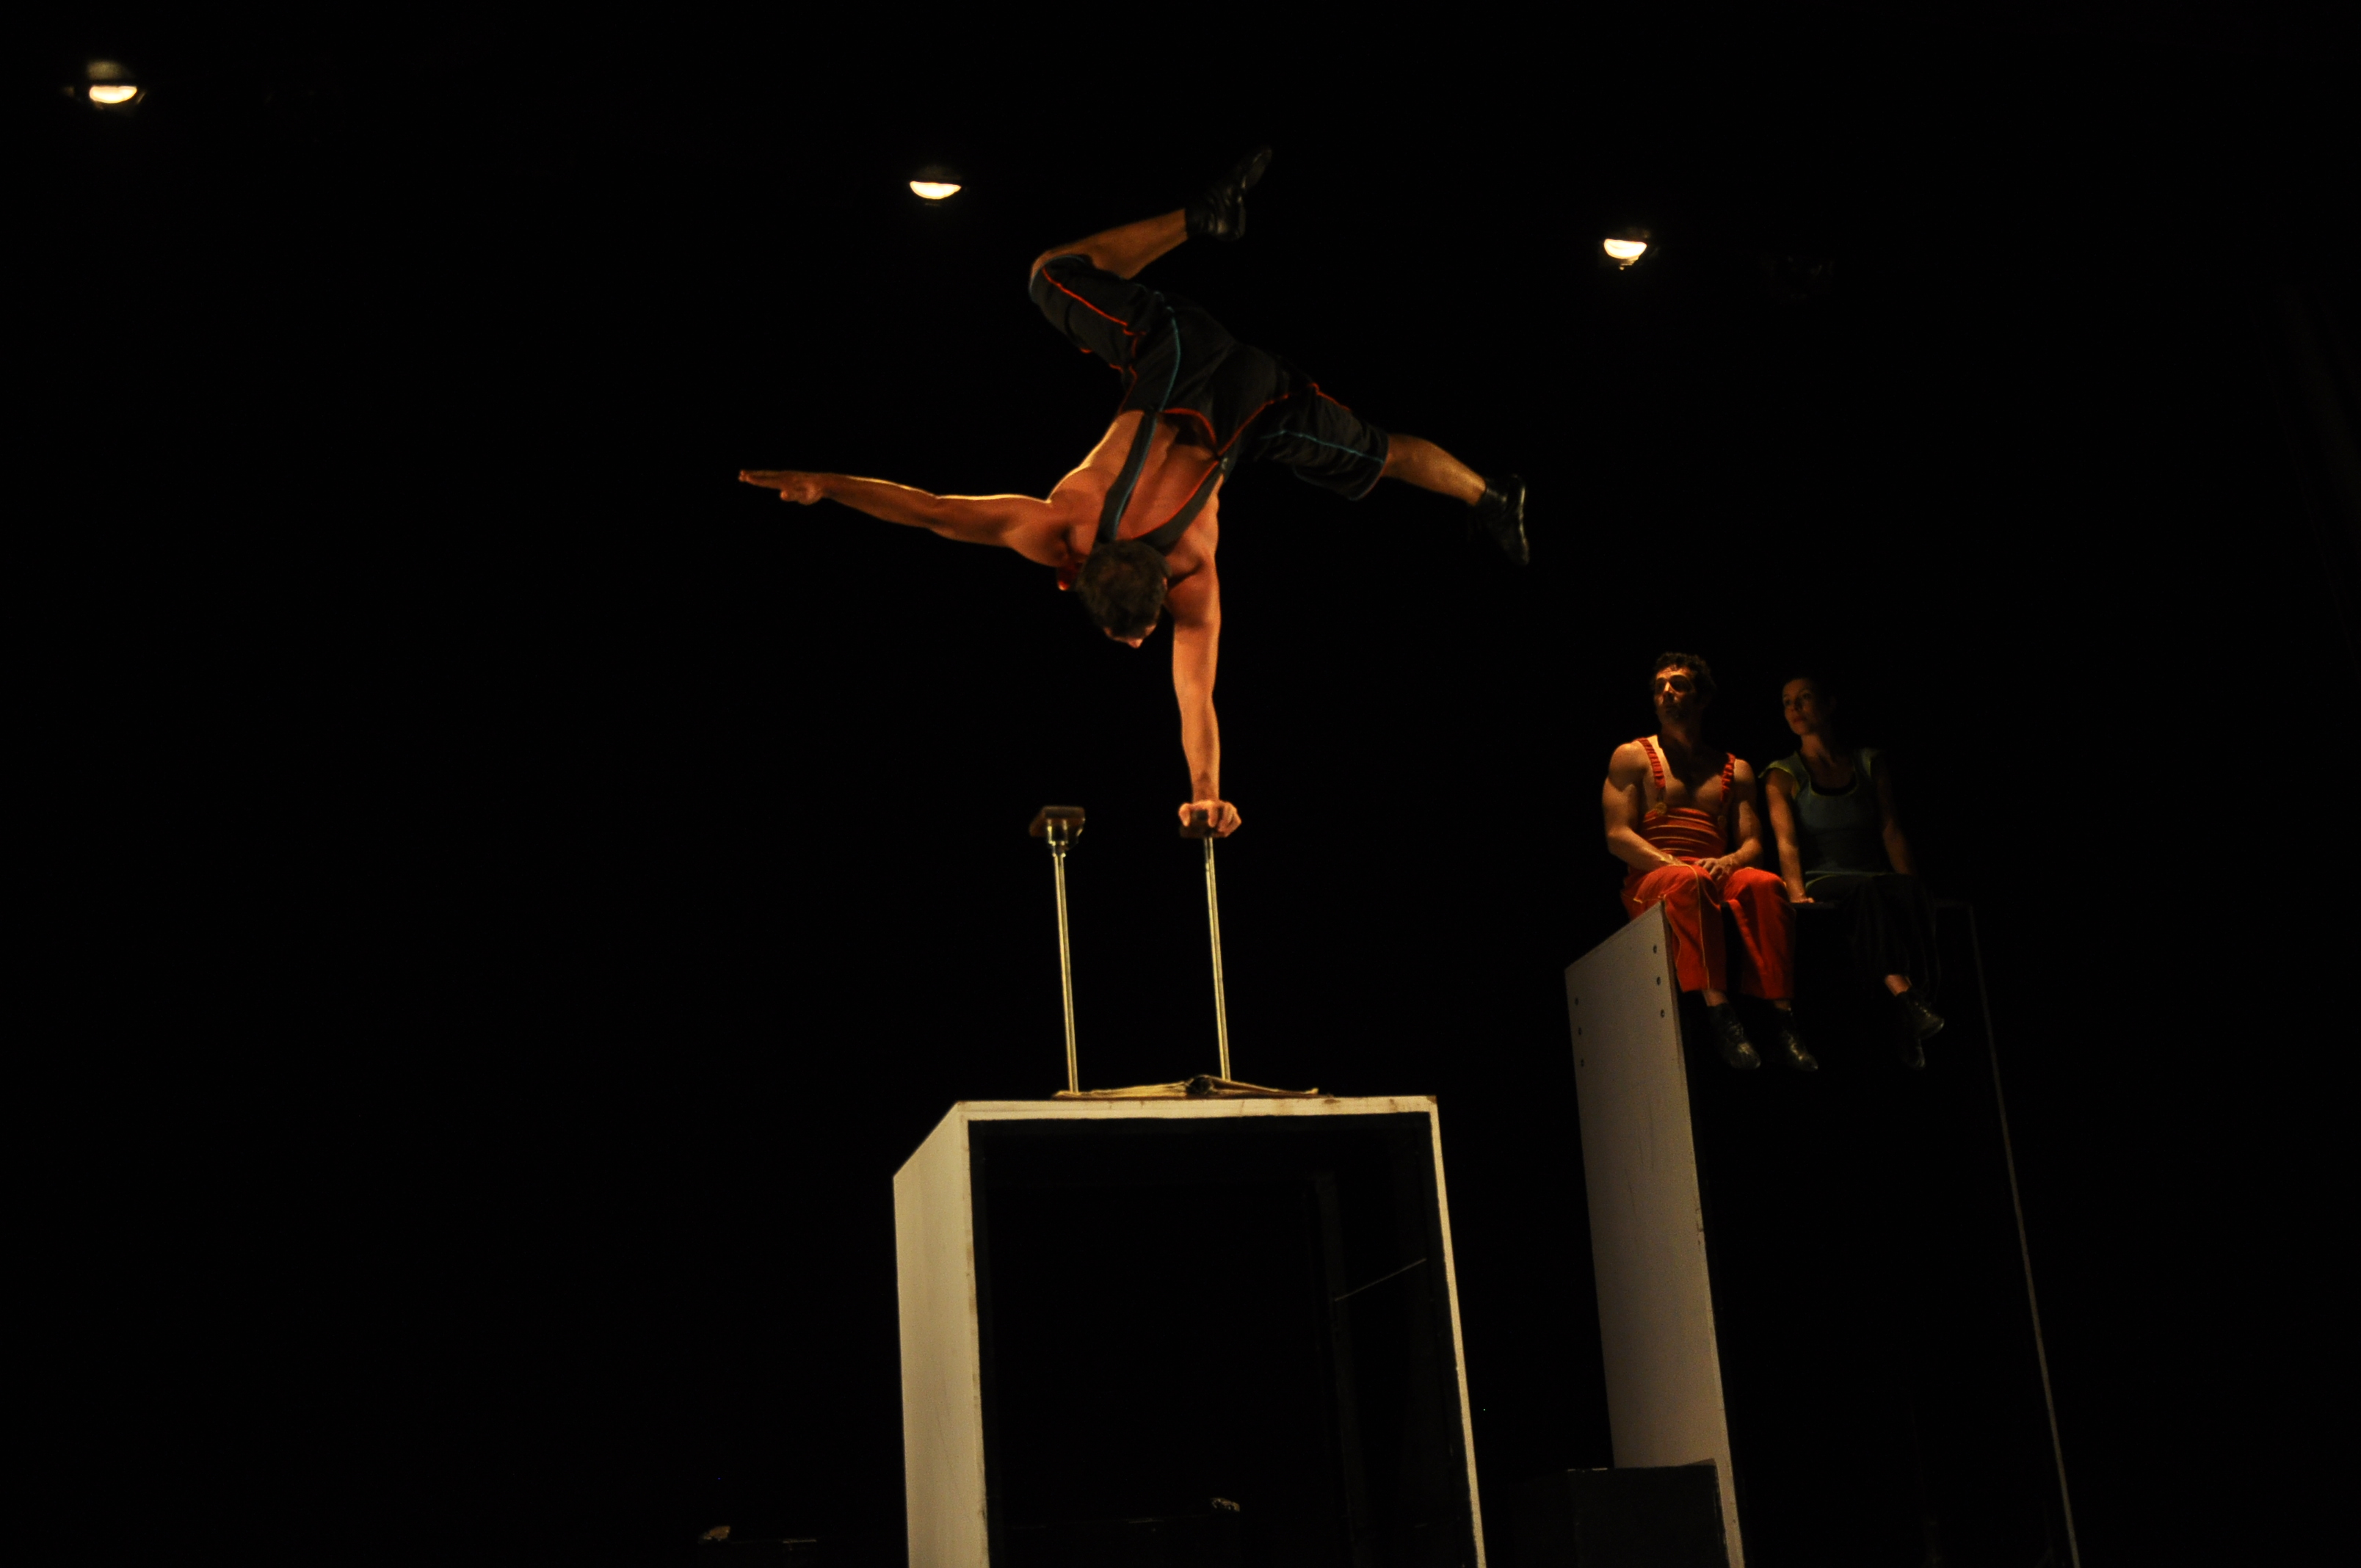 La Compagnie 3 Fois Rien in '2 Parallels' at Qadir Ali Baig Theatre Festival 2014